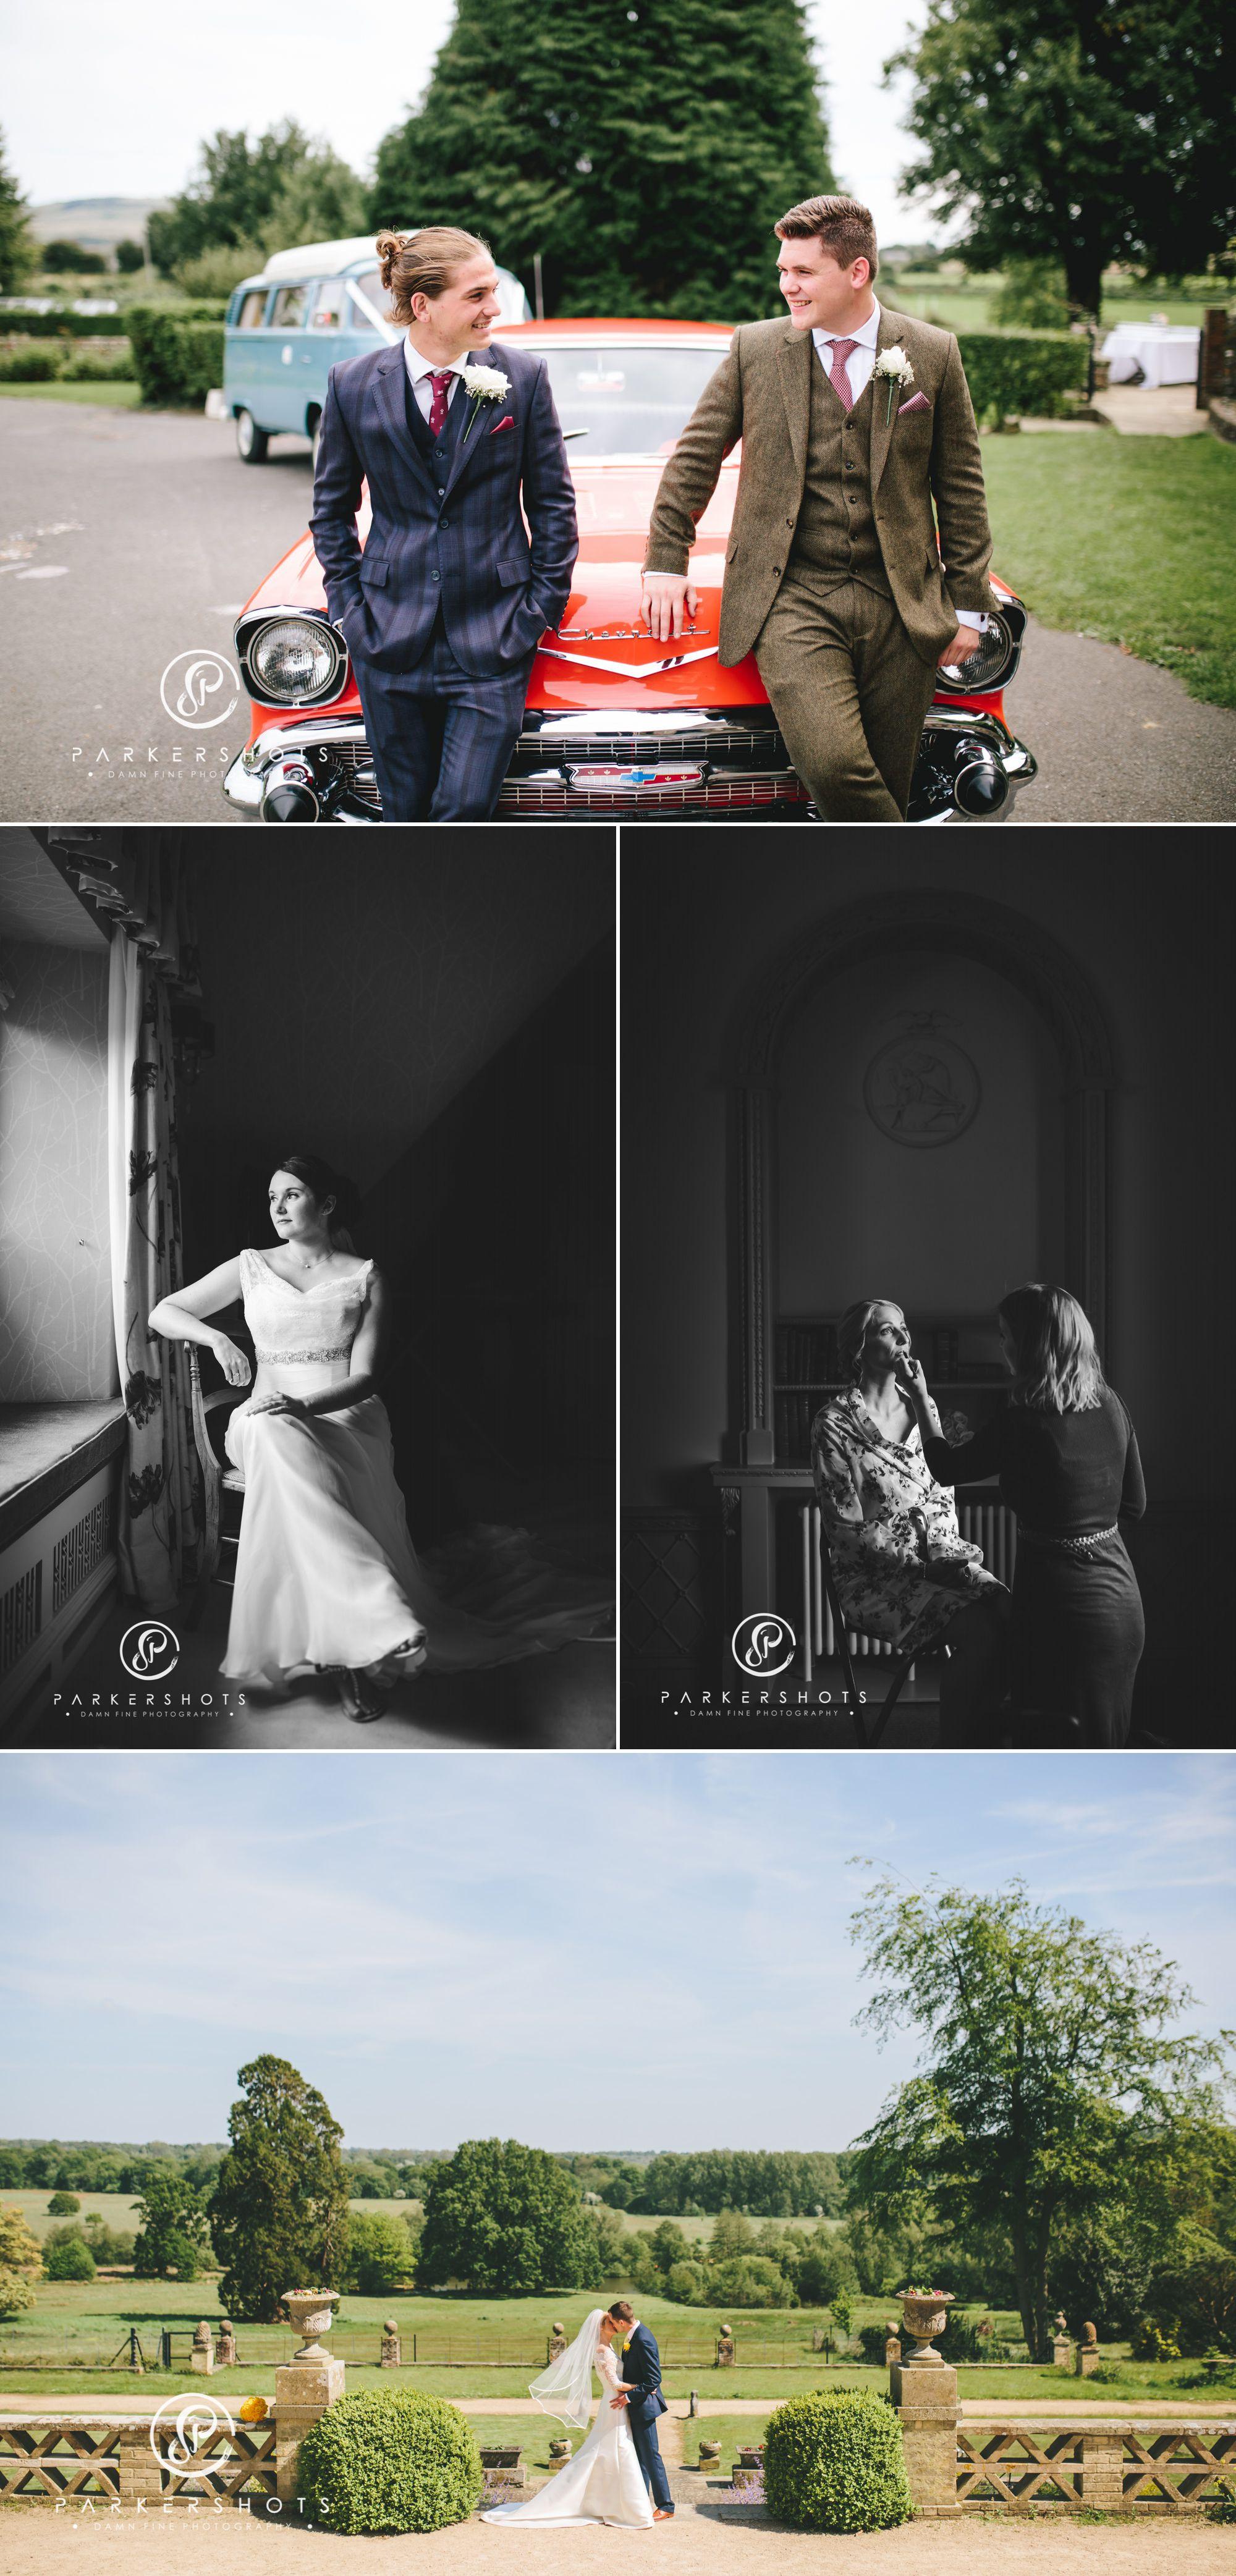 Best_Of_Wedding_Photographer_2015 20